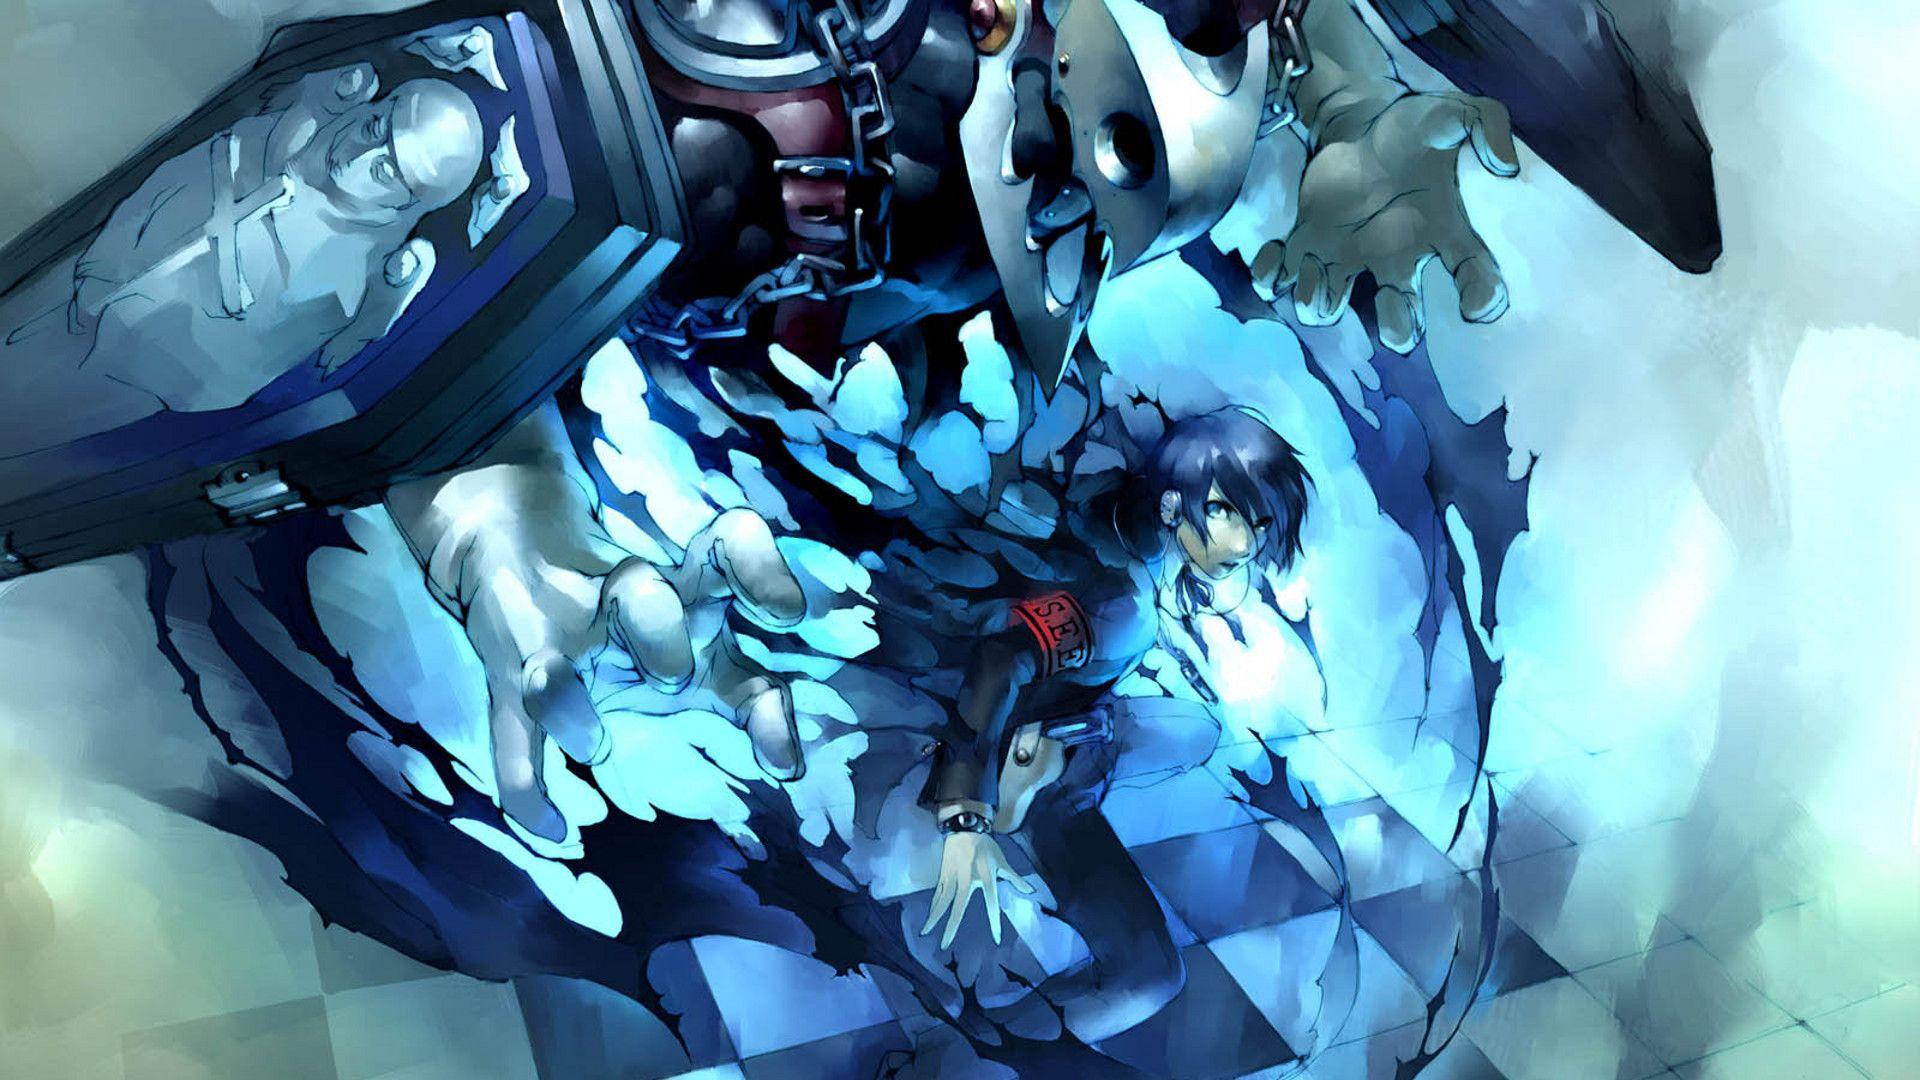 Persona 3 Fes Hdwallpapers Shin Megami Tensei Persona